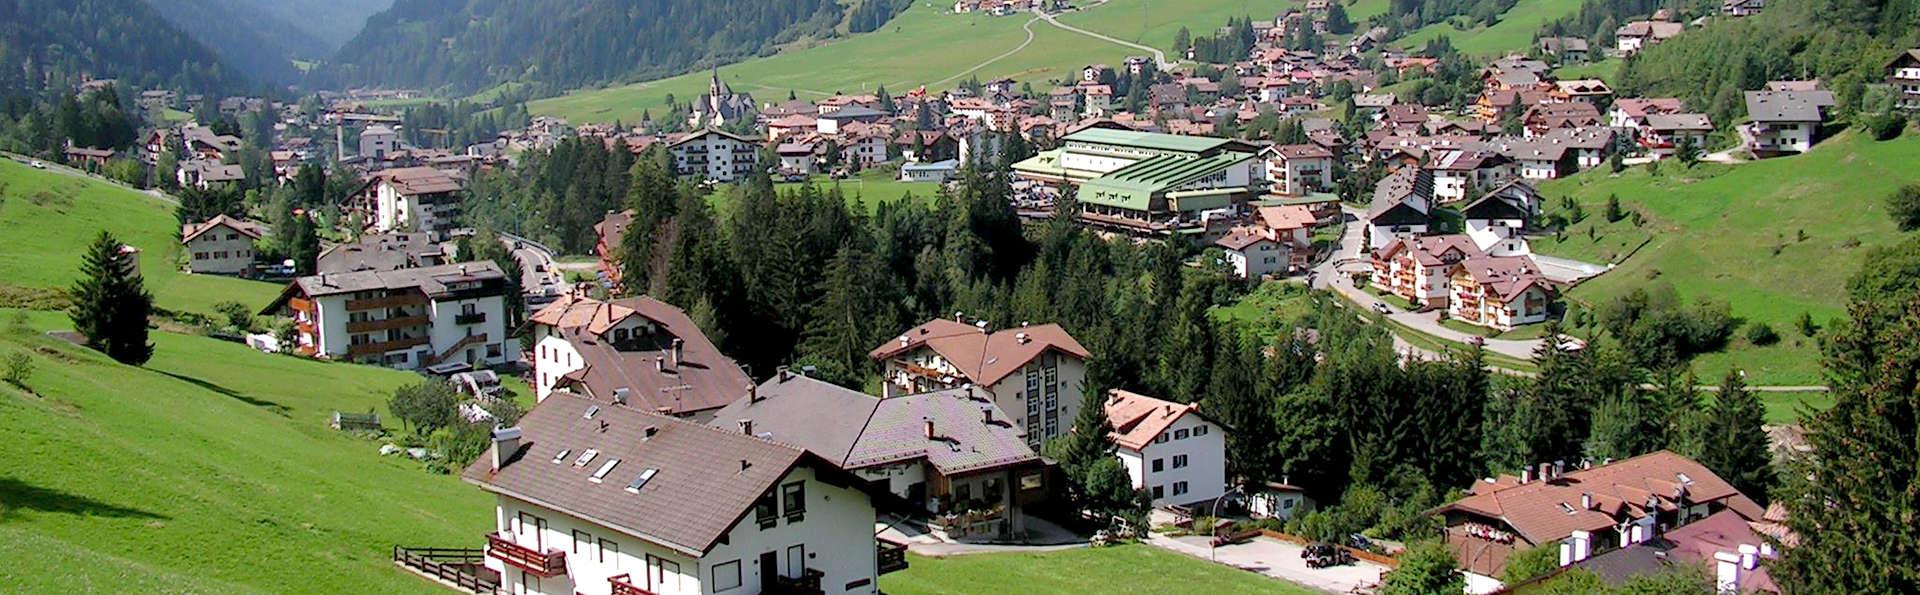 Hotel Bellaria - Edit_Destination.jpg